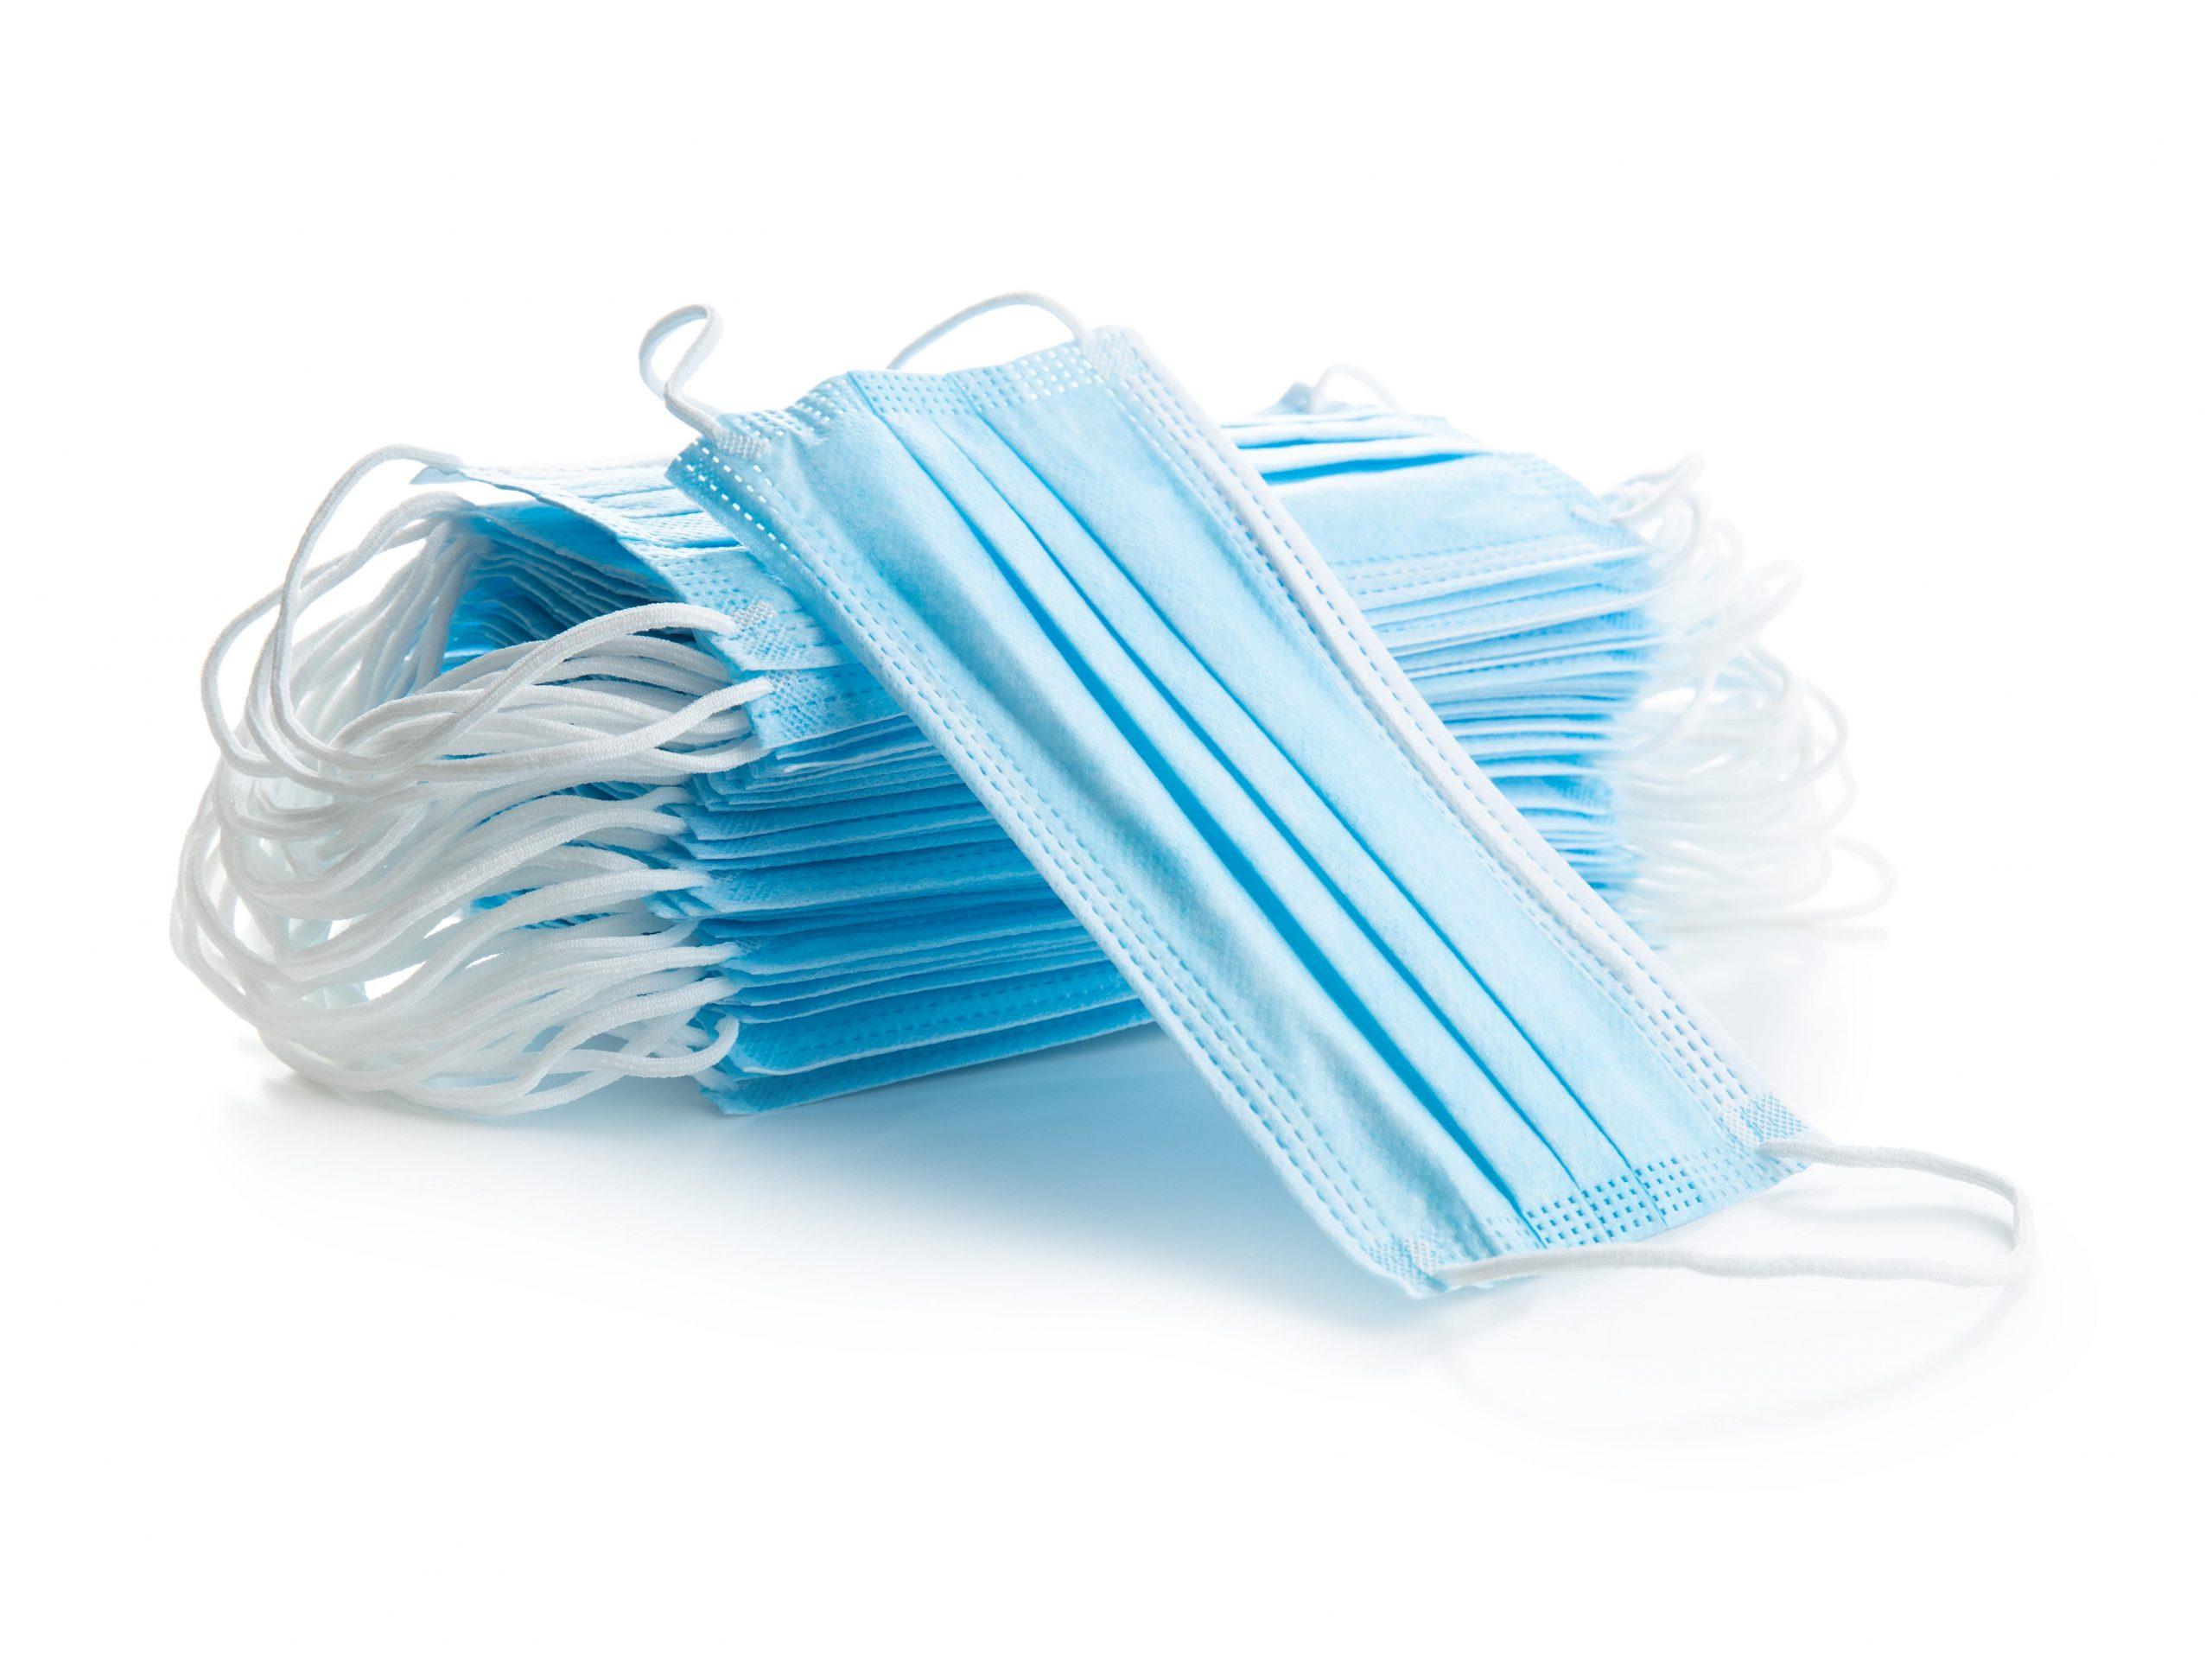 blue-paper-face-masks-corona-virus-protection-9G9X7R4-min